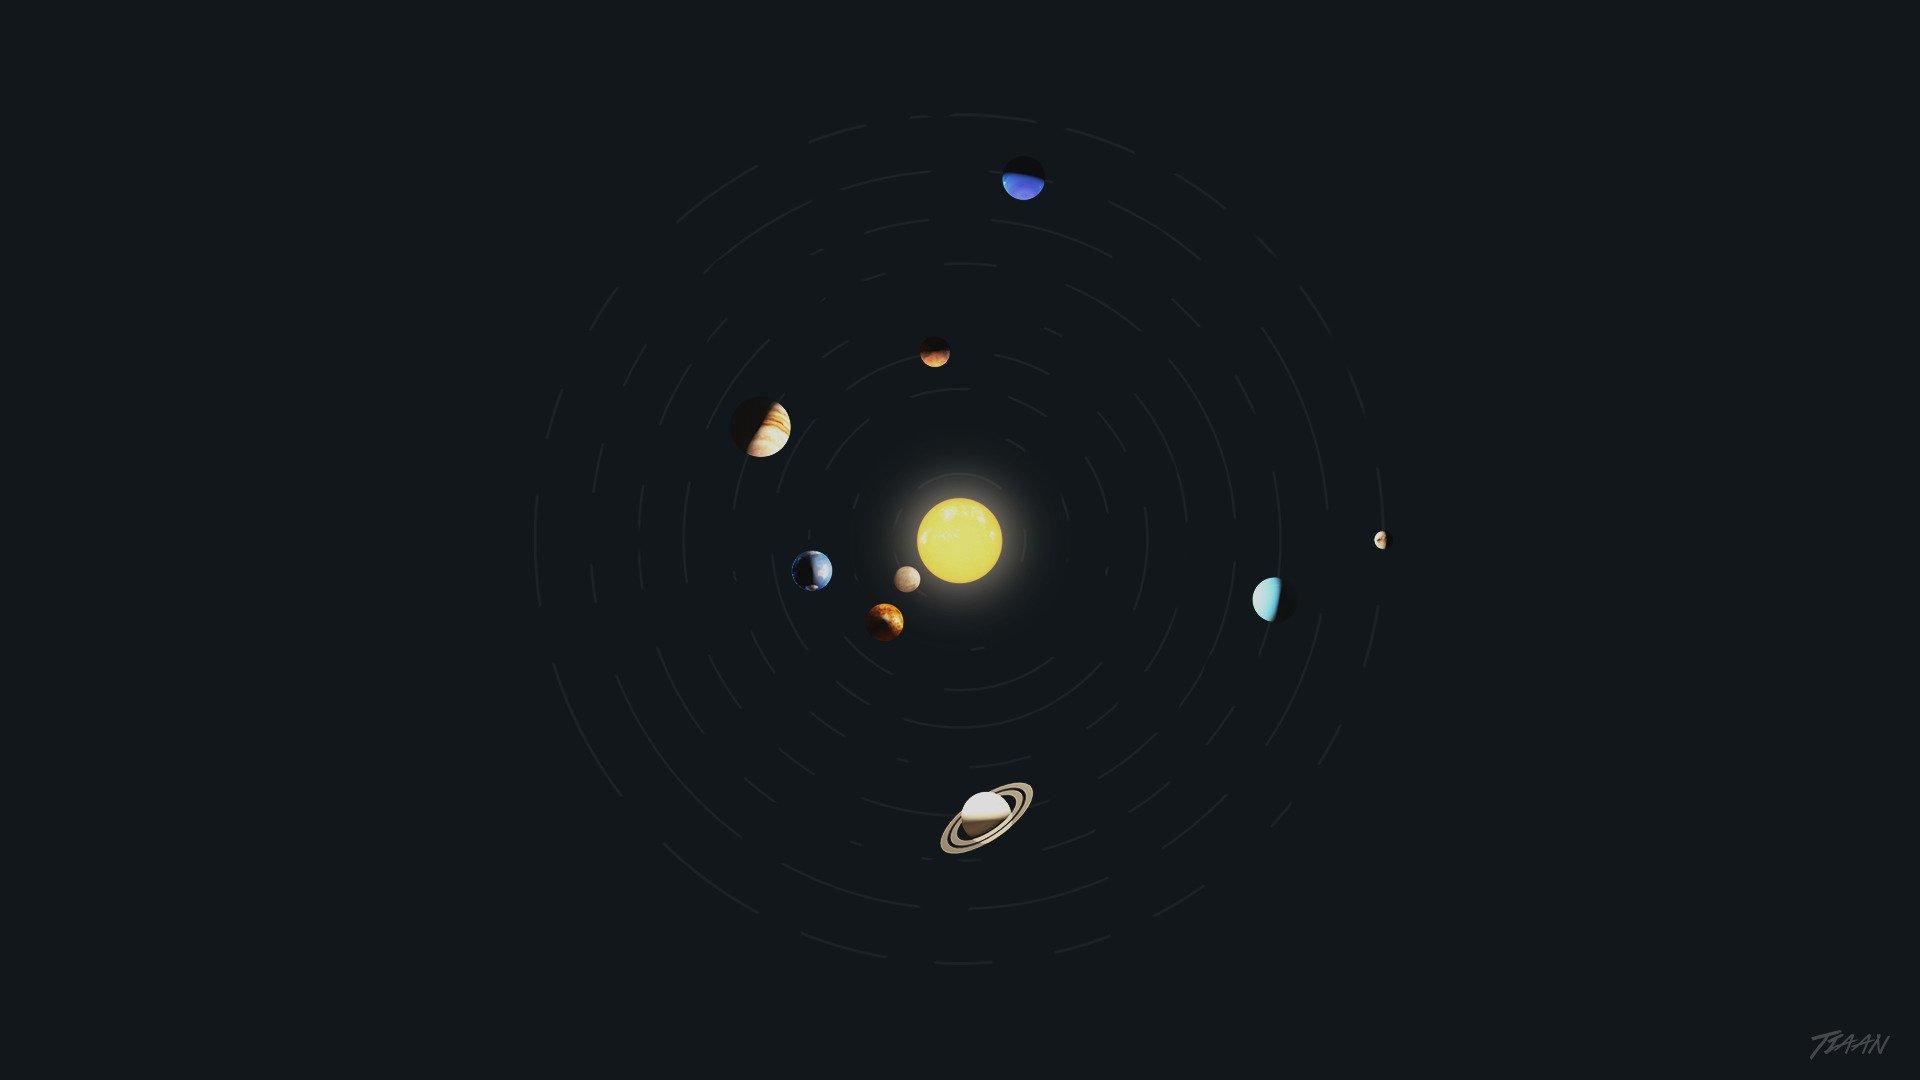 Solar System, Minimalism, Space Art, Planet, Photoshop